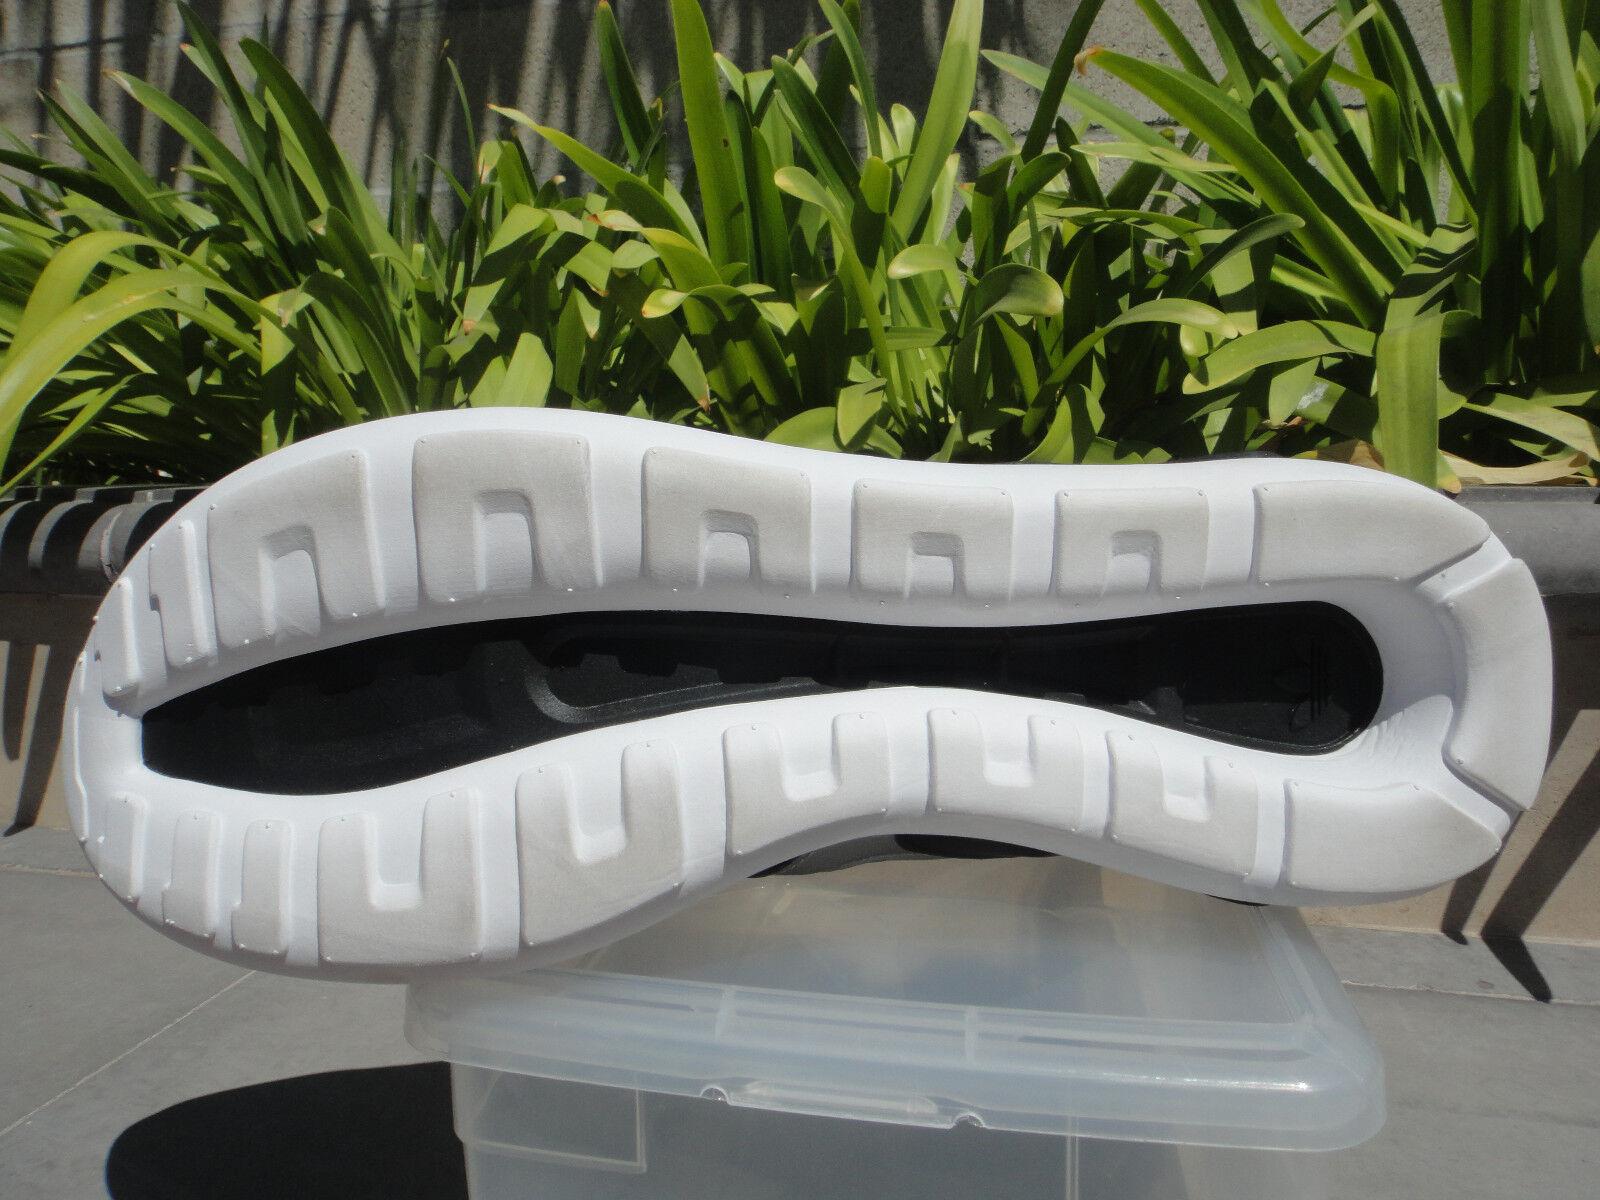 Vendita!adidas tubulare nero / grigio / bianco us11.5 corridore cuoio / tessile b25525 uomini us11.5 bianco e13371